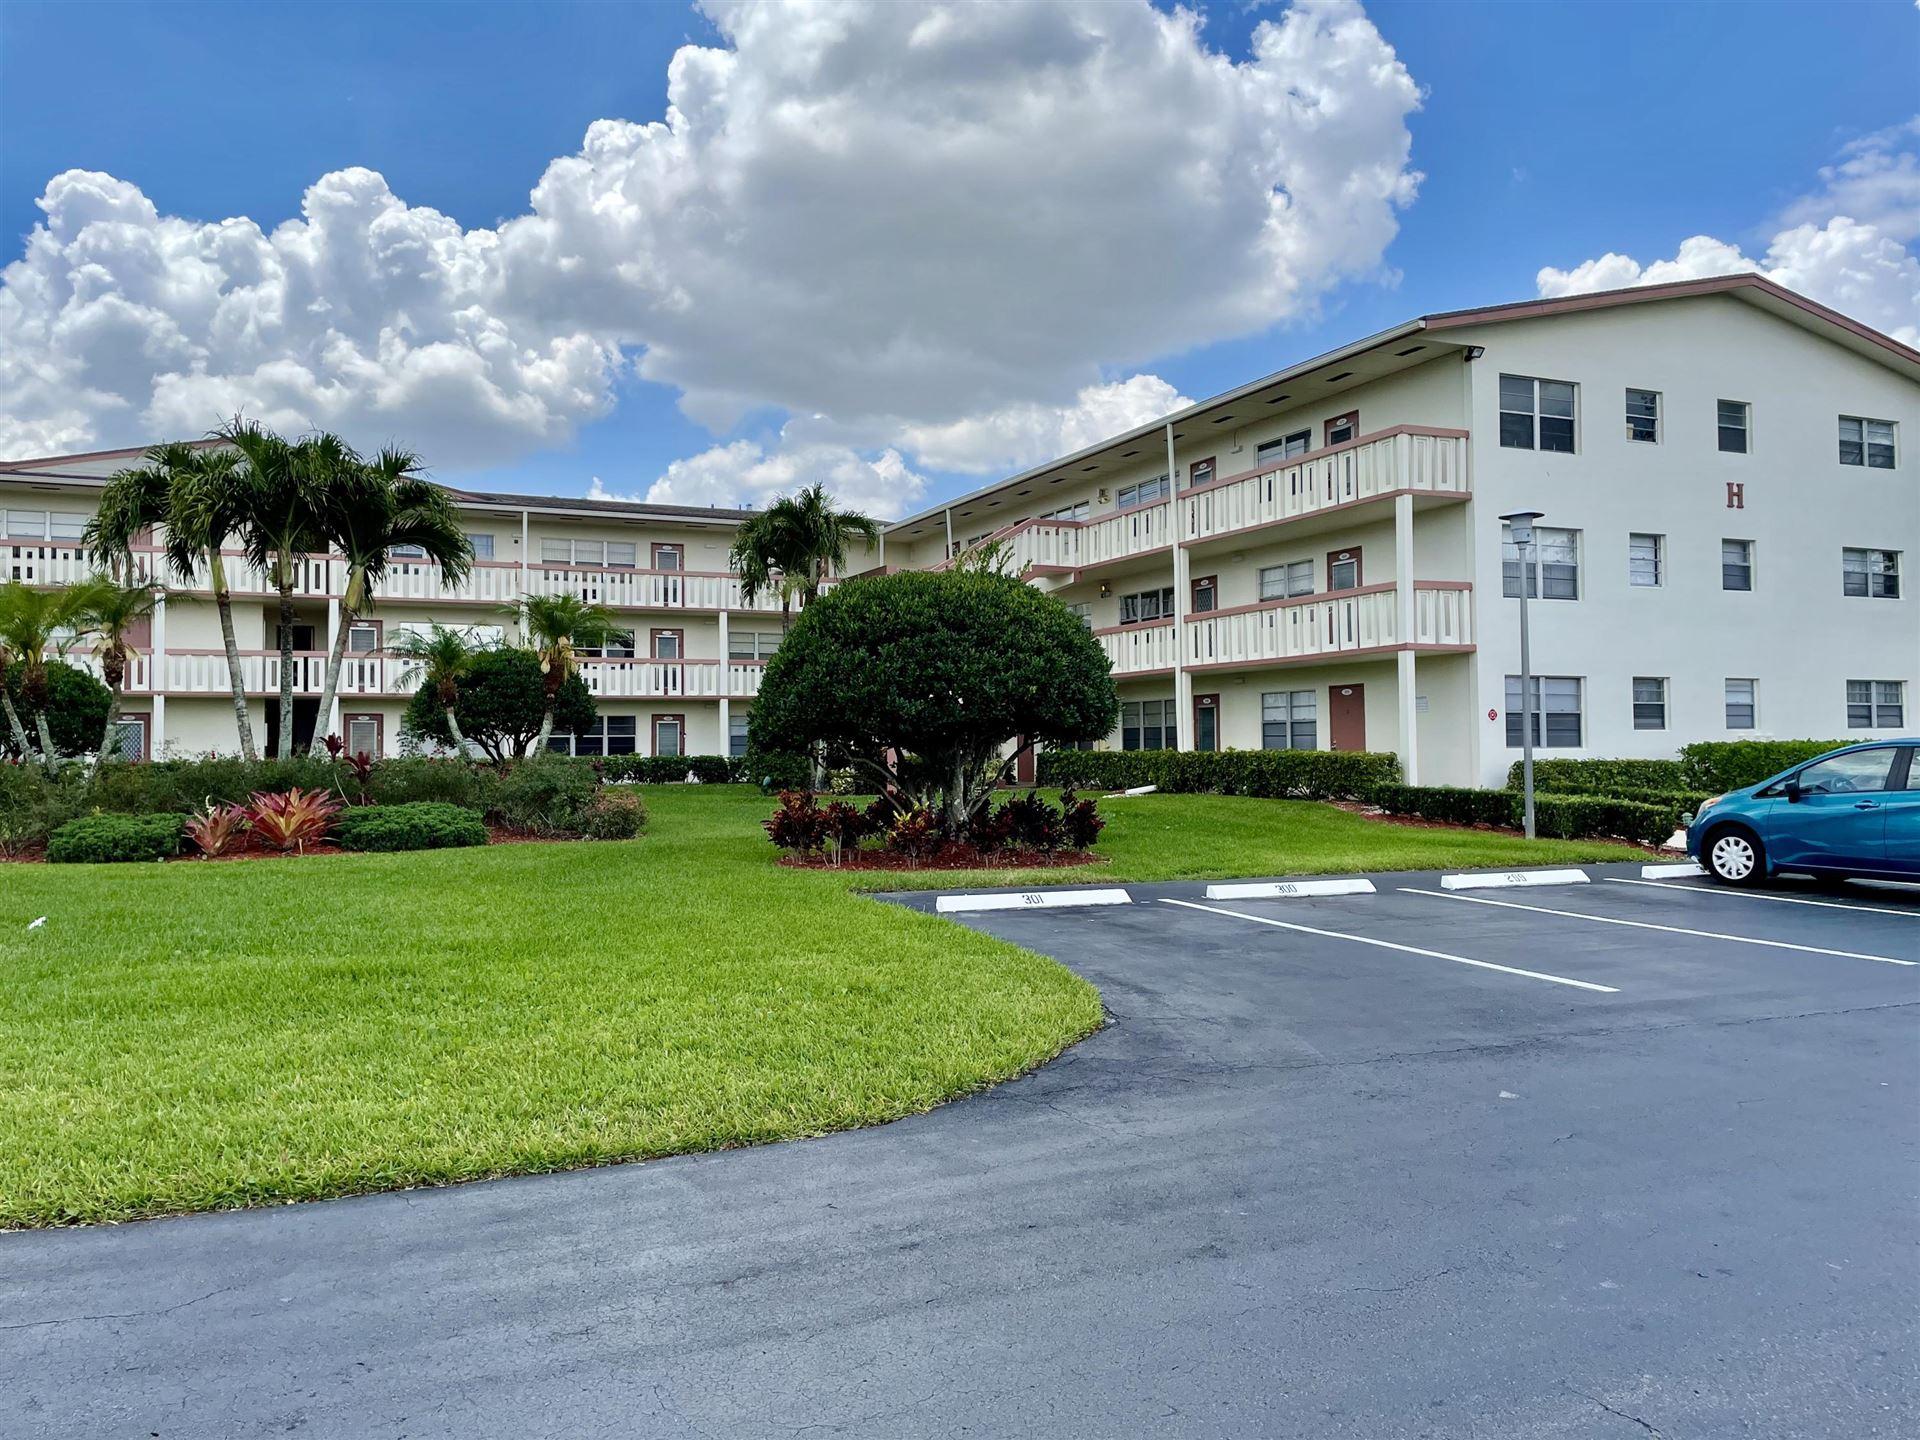 296 Preston H, Boca Raton, FL 33434 - MLS#: RX-10712425